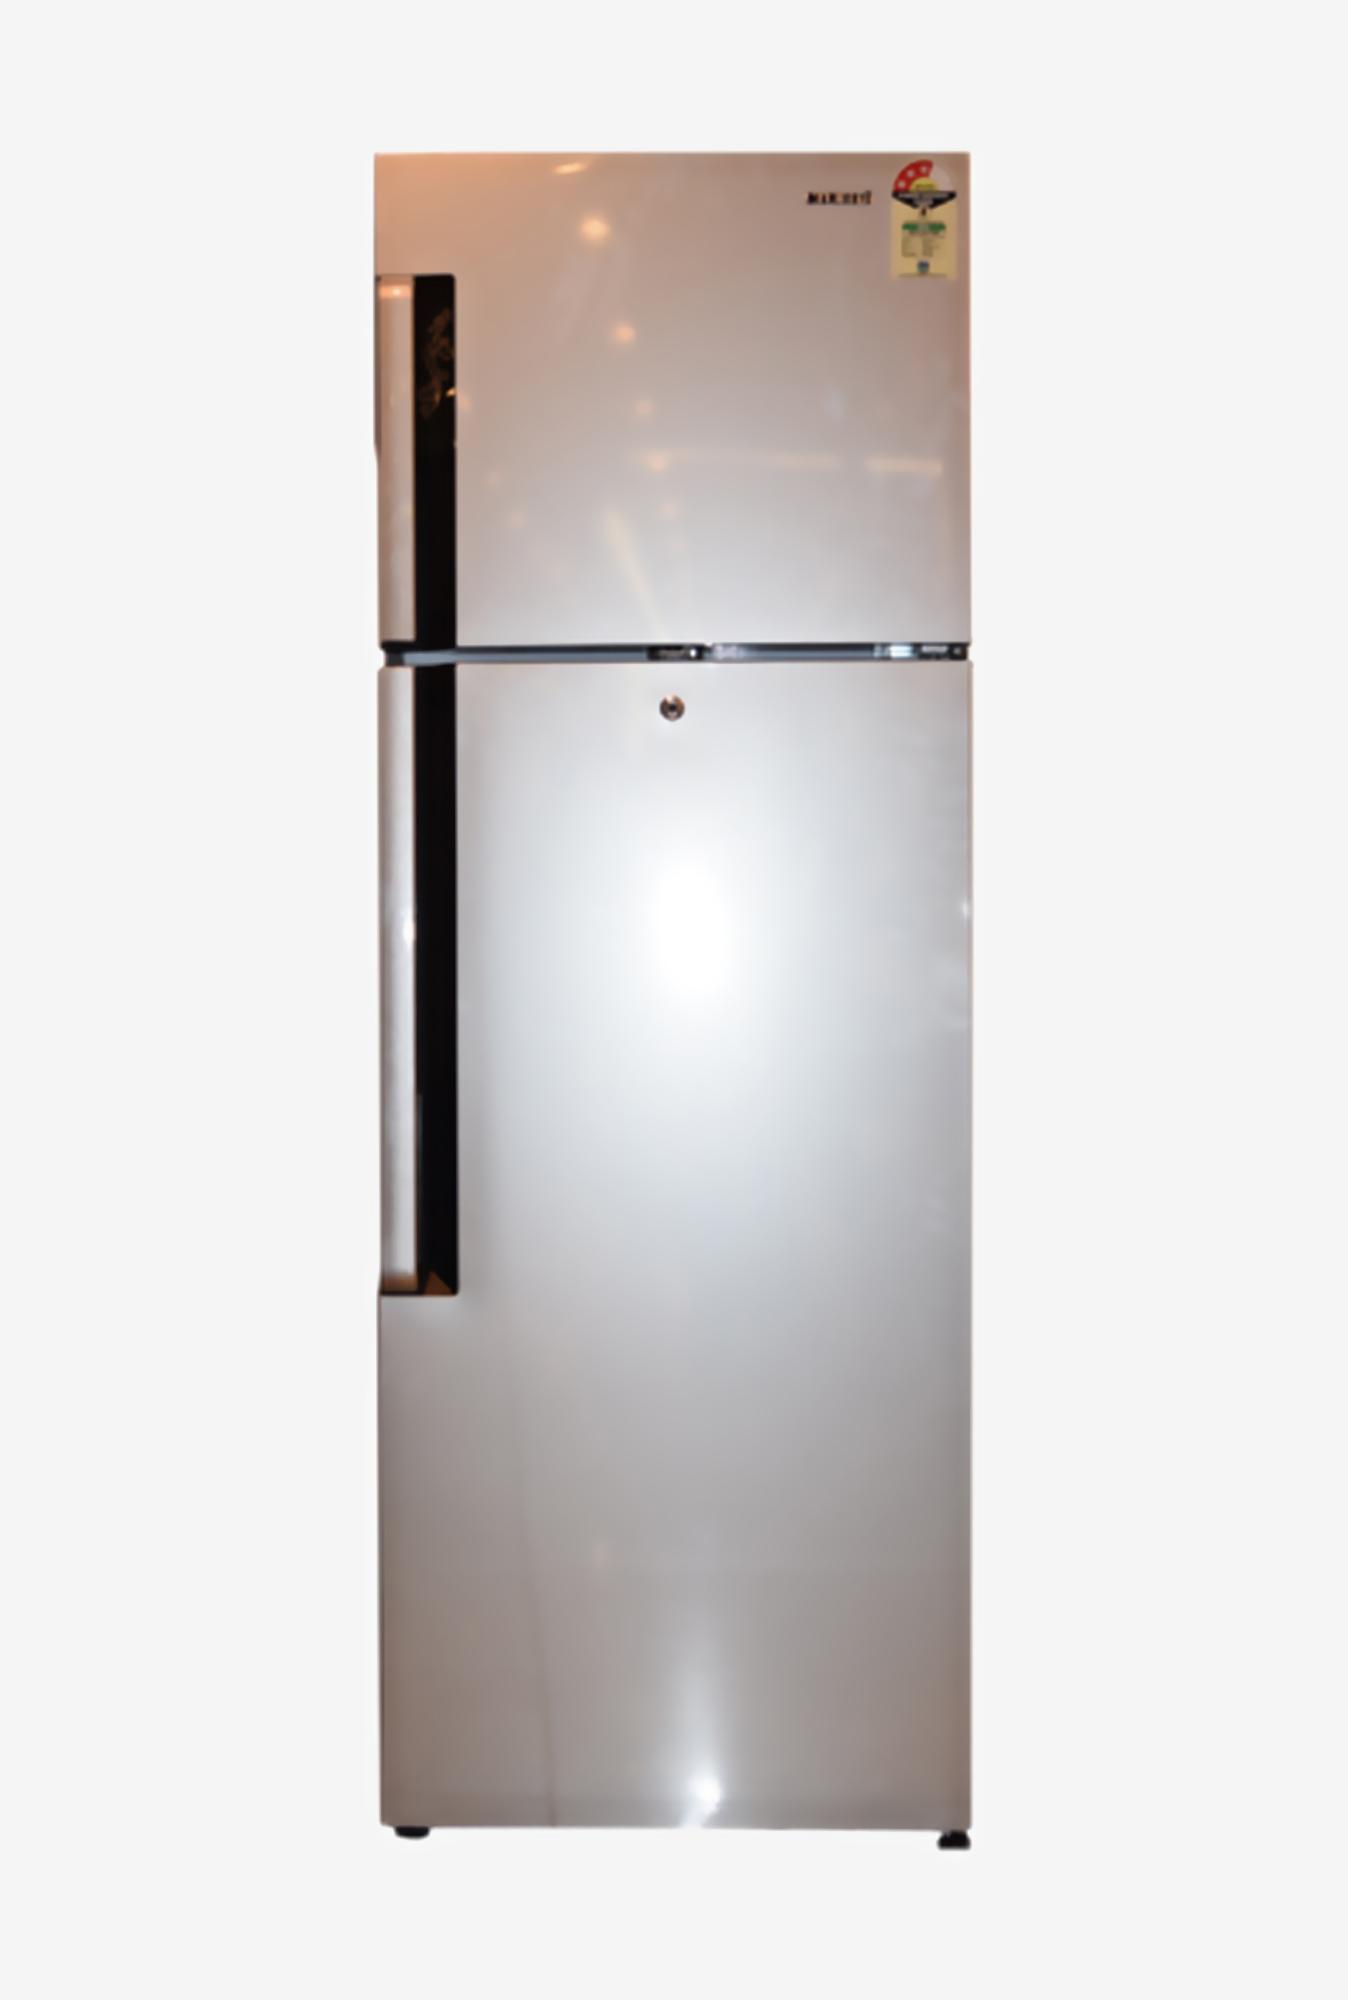 CROMA DOUBLE DOOR REFRIGERATOR CRAR2387 Reviews | Price List in ...